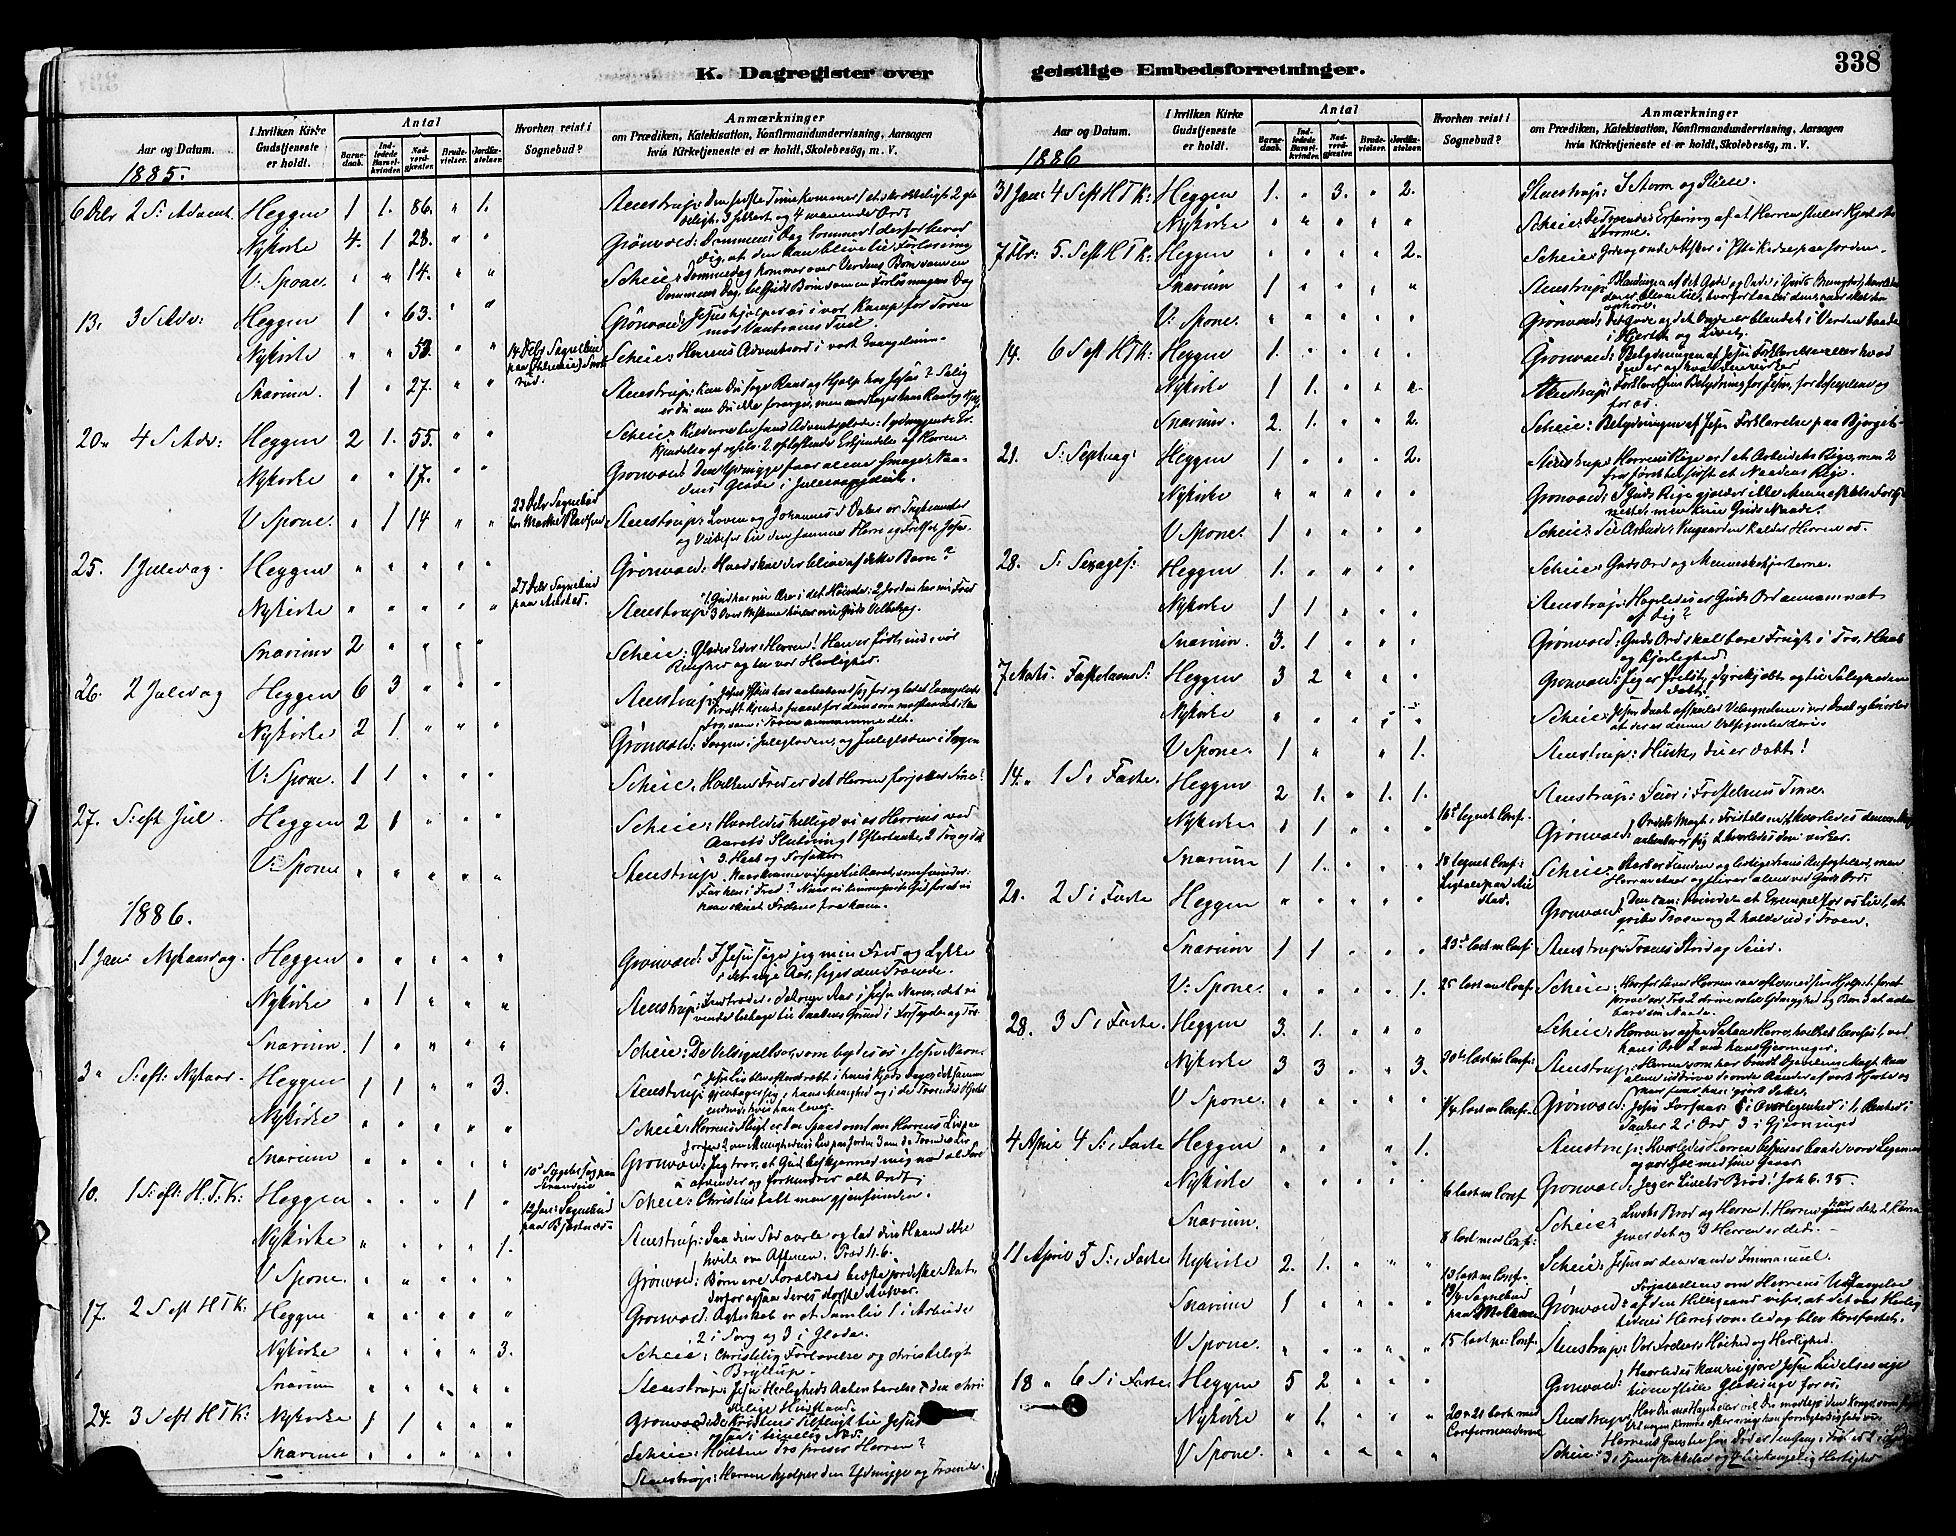 SAKO, Modum kirkebøker, F/Fa/L0011: Ministerialbok nr. 11, 1877-1889, s. 338